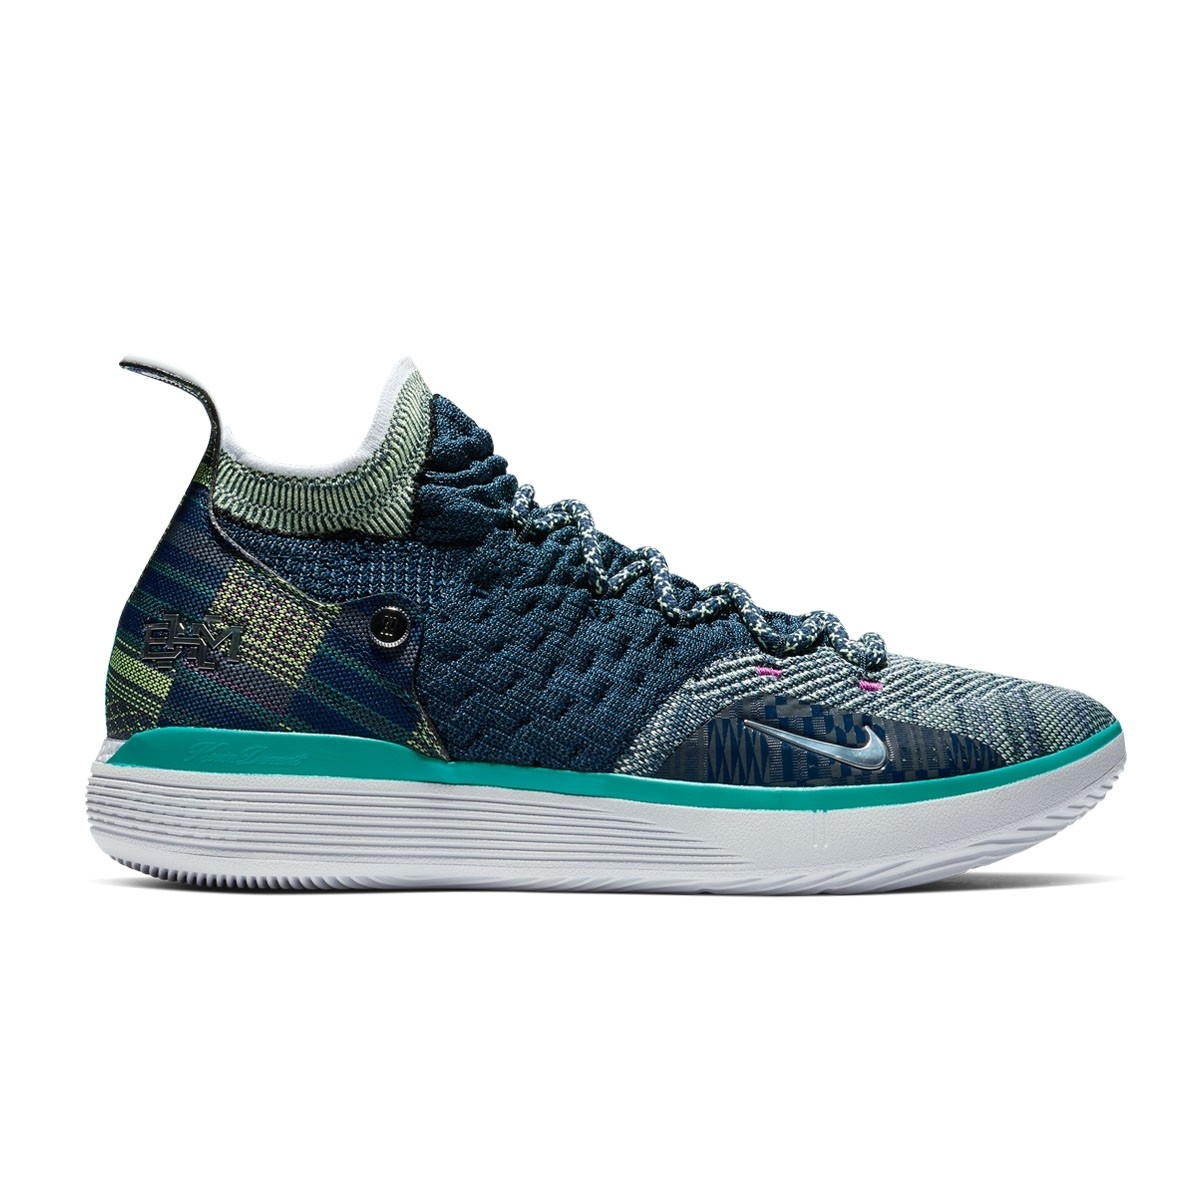 Nike KD 11 'BHM'